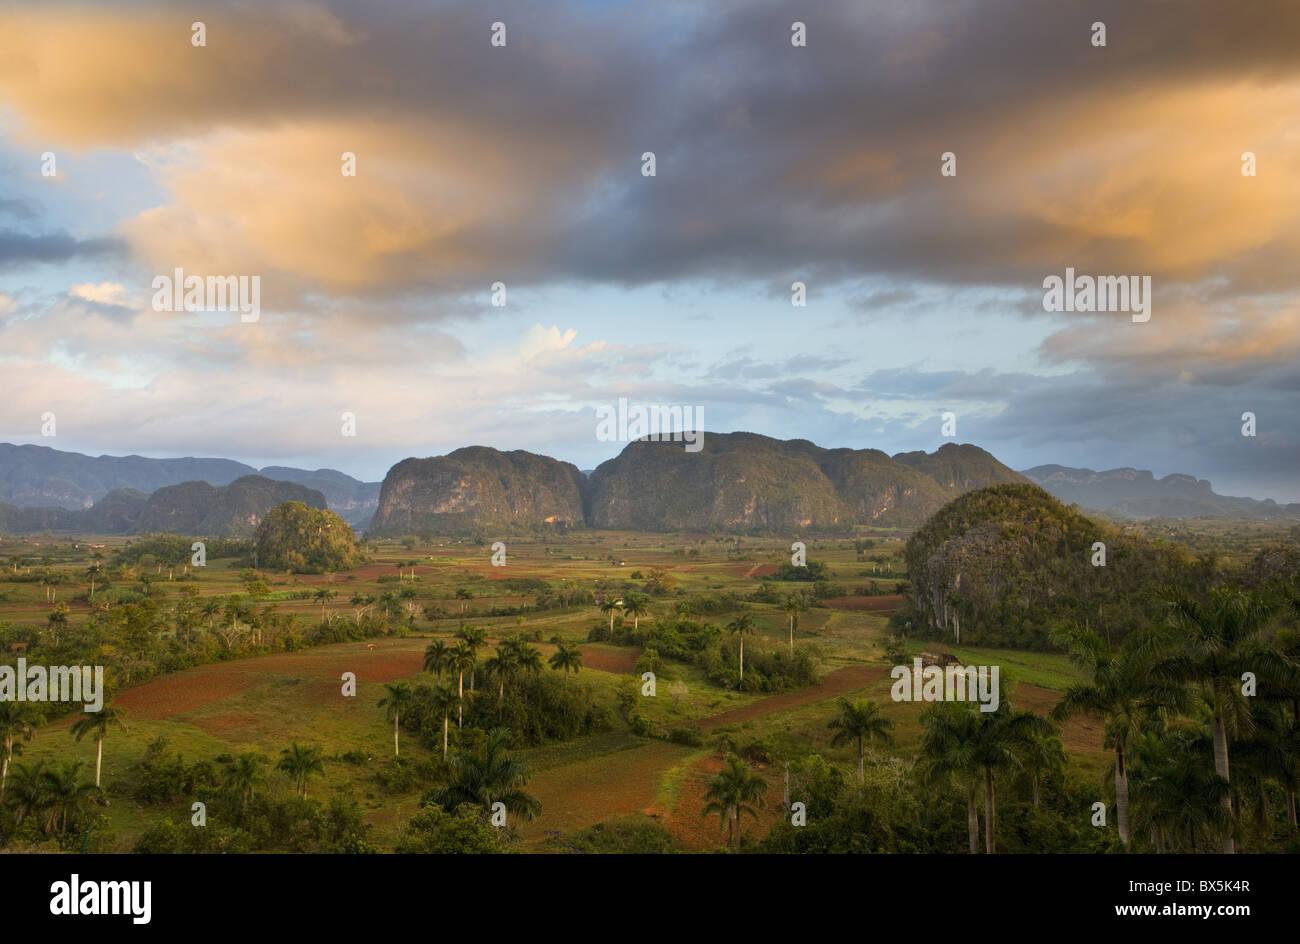 Blick von Vinales Tal im Morgengrauen vom Gelände des Hotel Los Jasmines, Pinar Del Rio, Kuba Stockbild